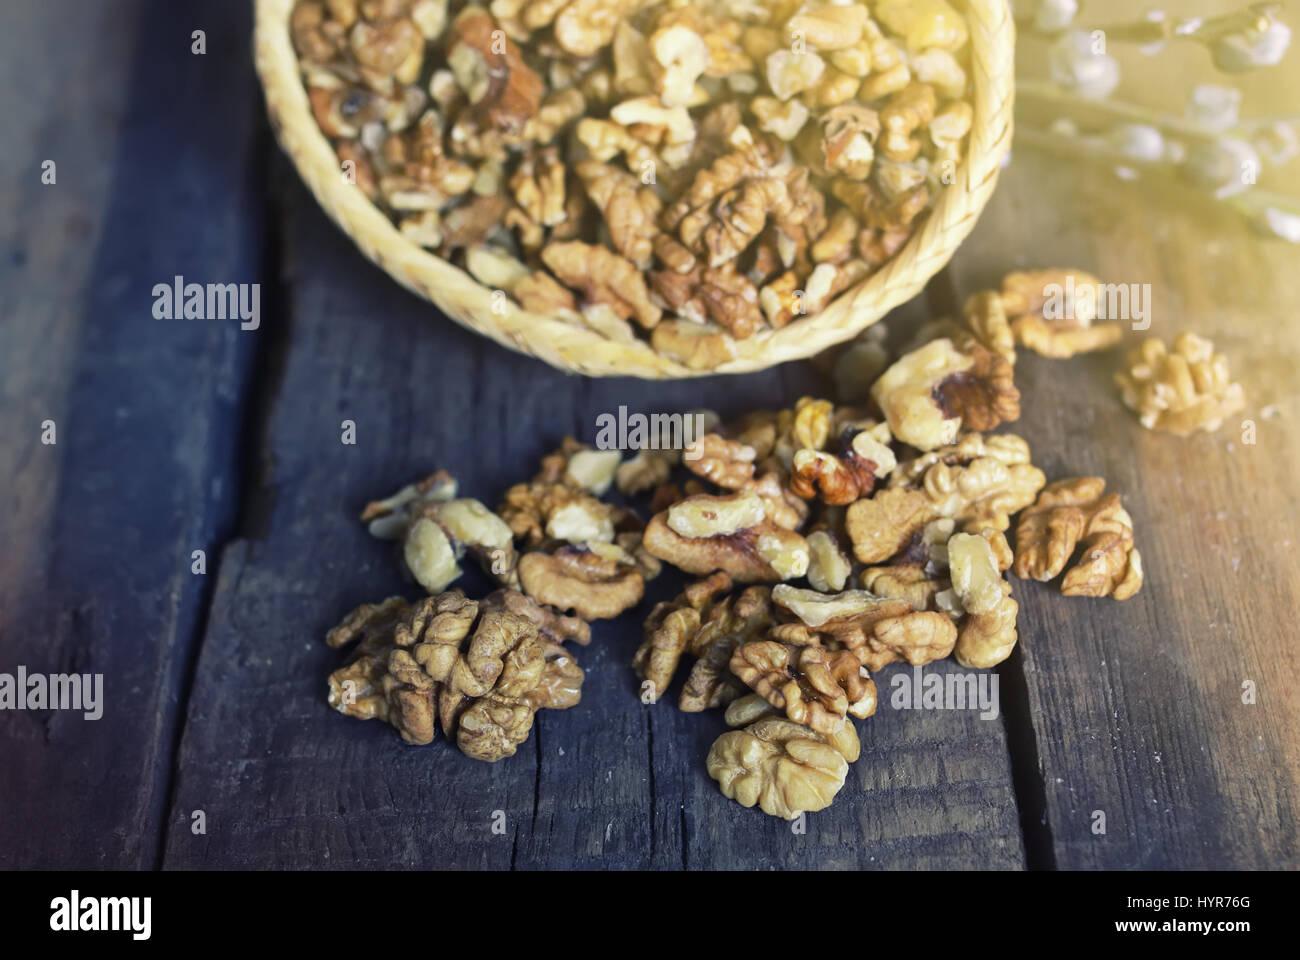 walnut on wooden background - Stock Image